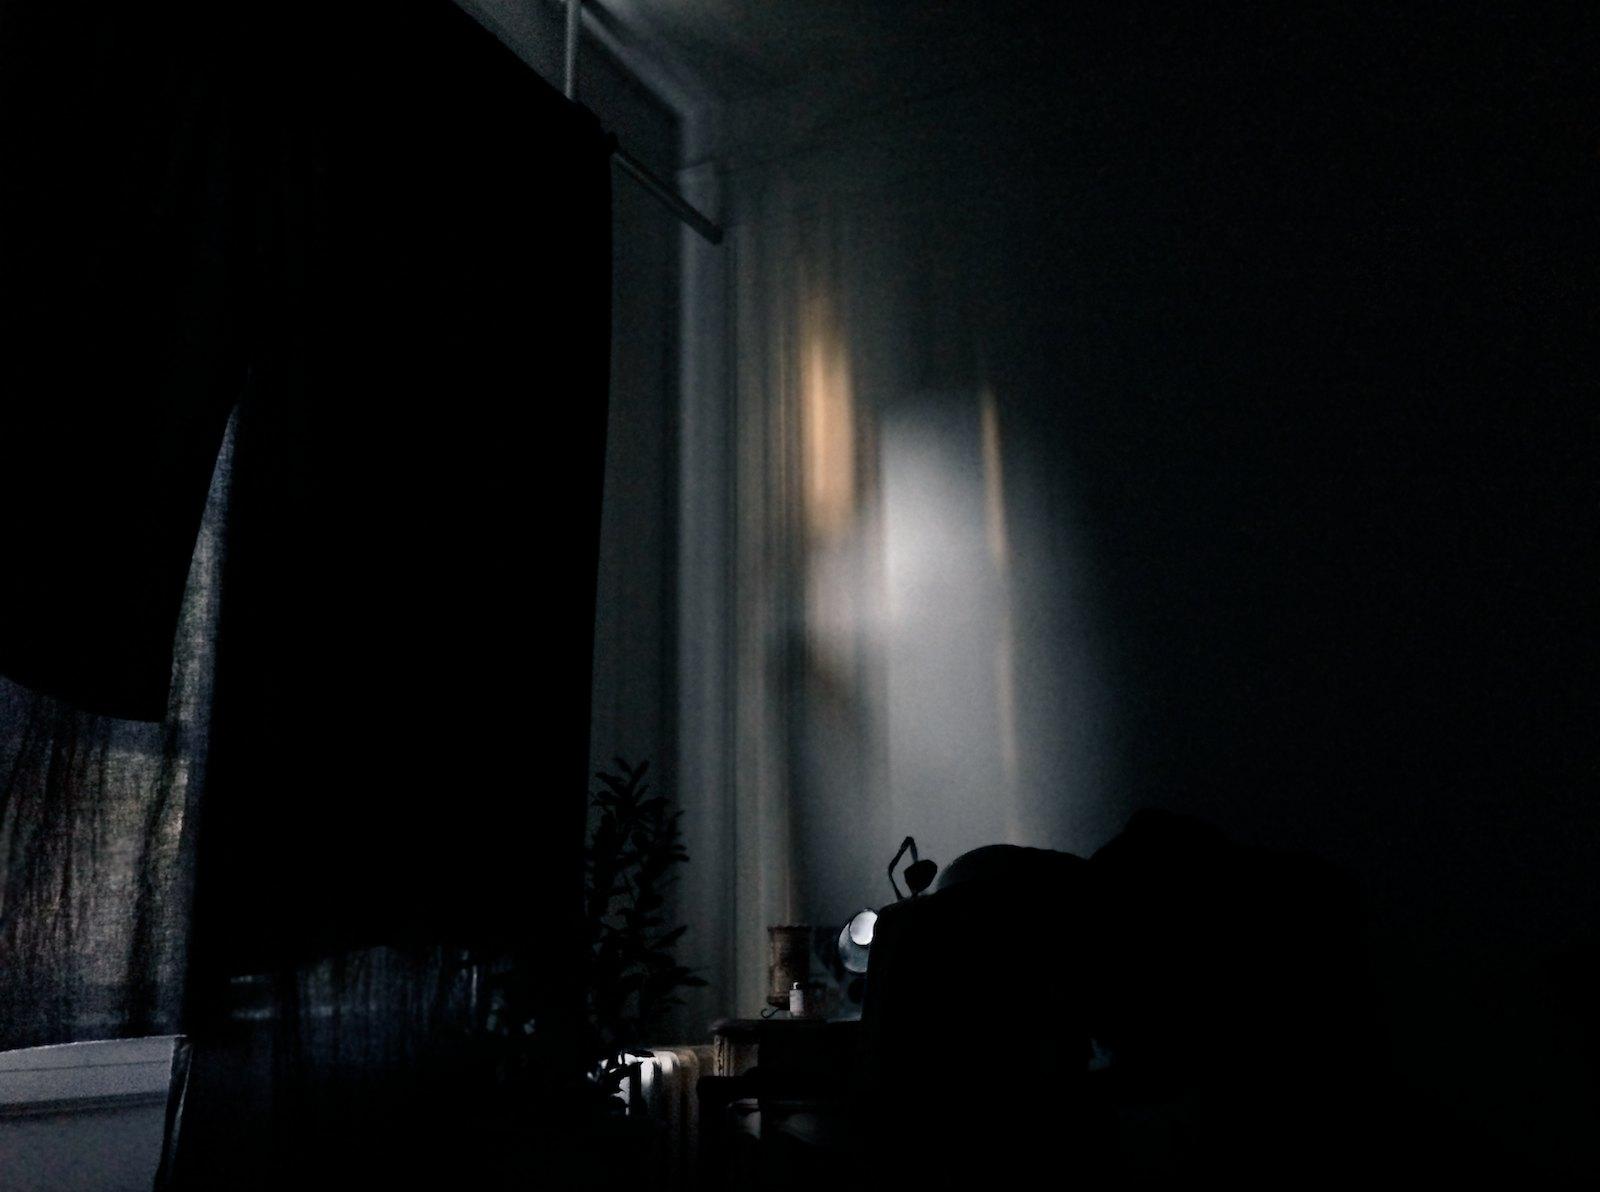 Black curtain, 2014, giclée print, 111 x 149 cm ed. 5